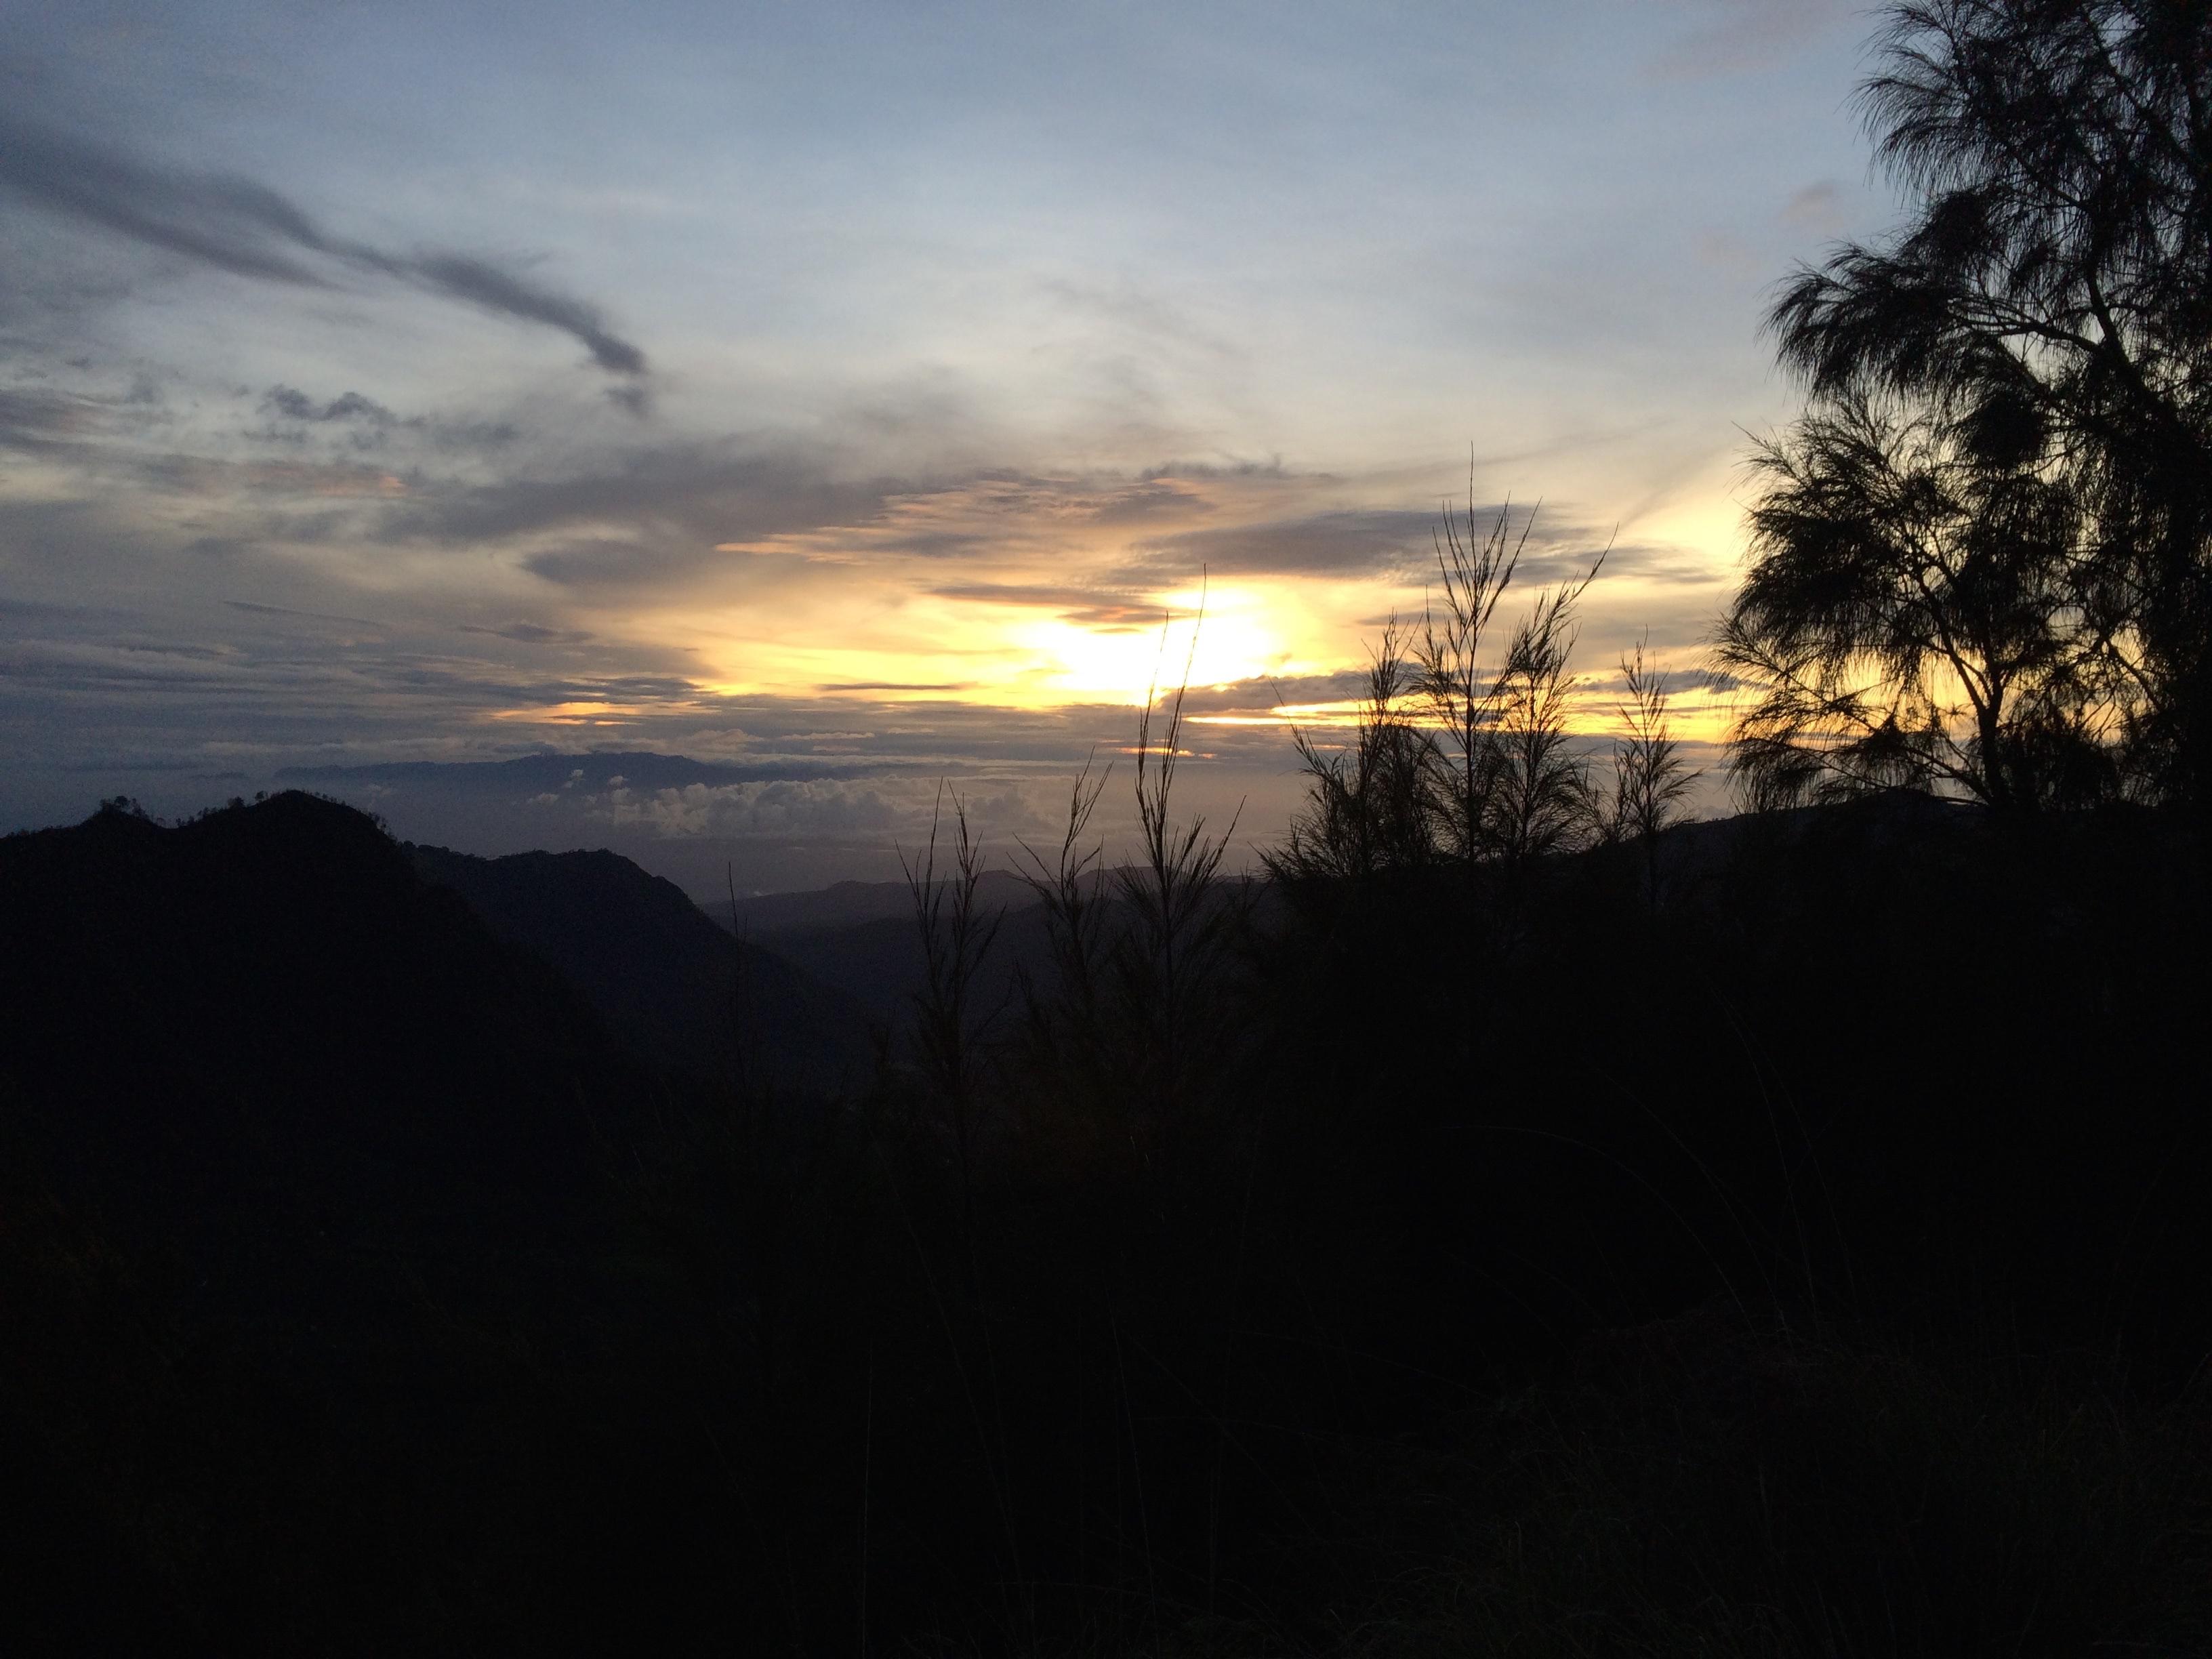 Sunrise at Bromo